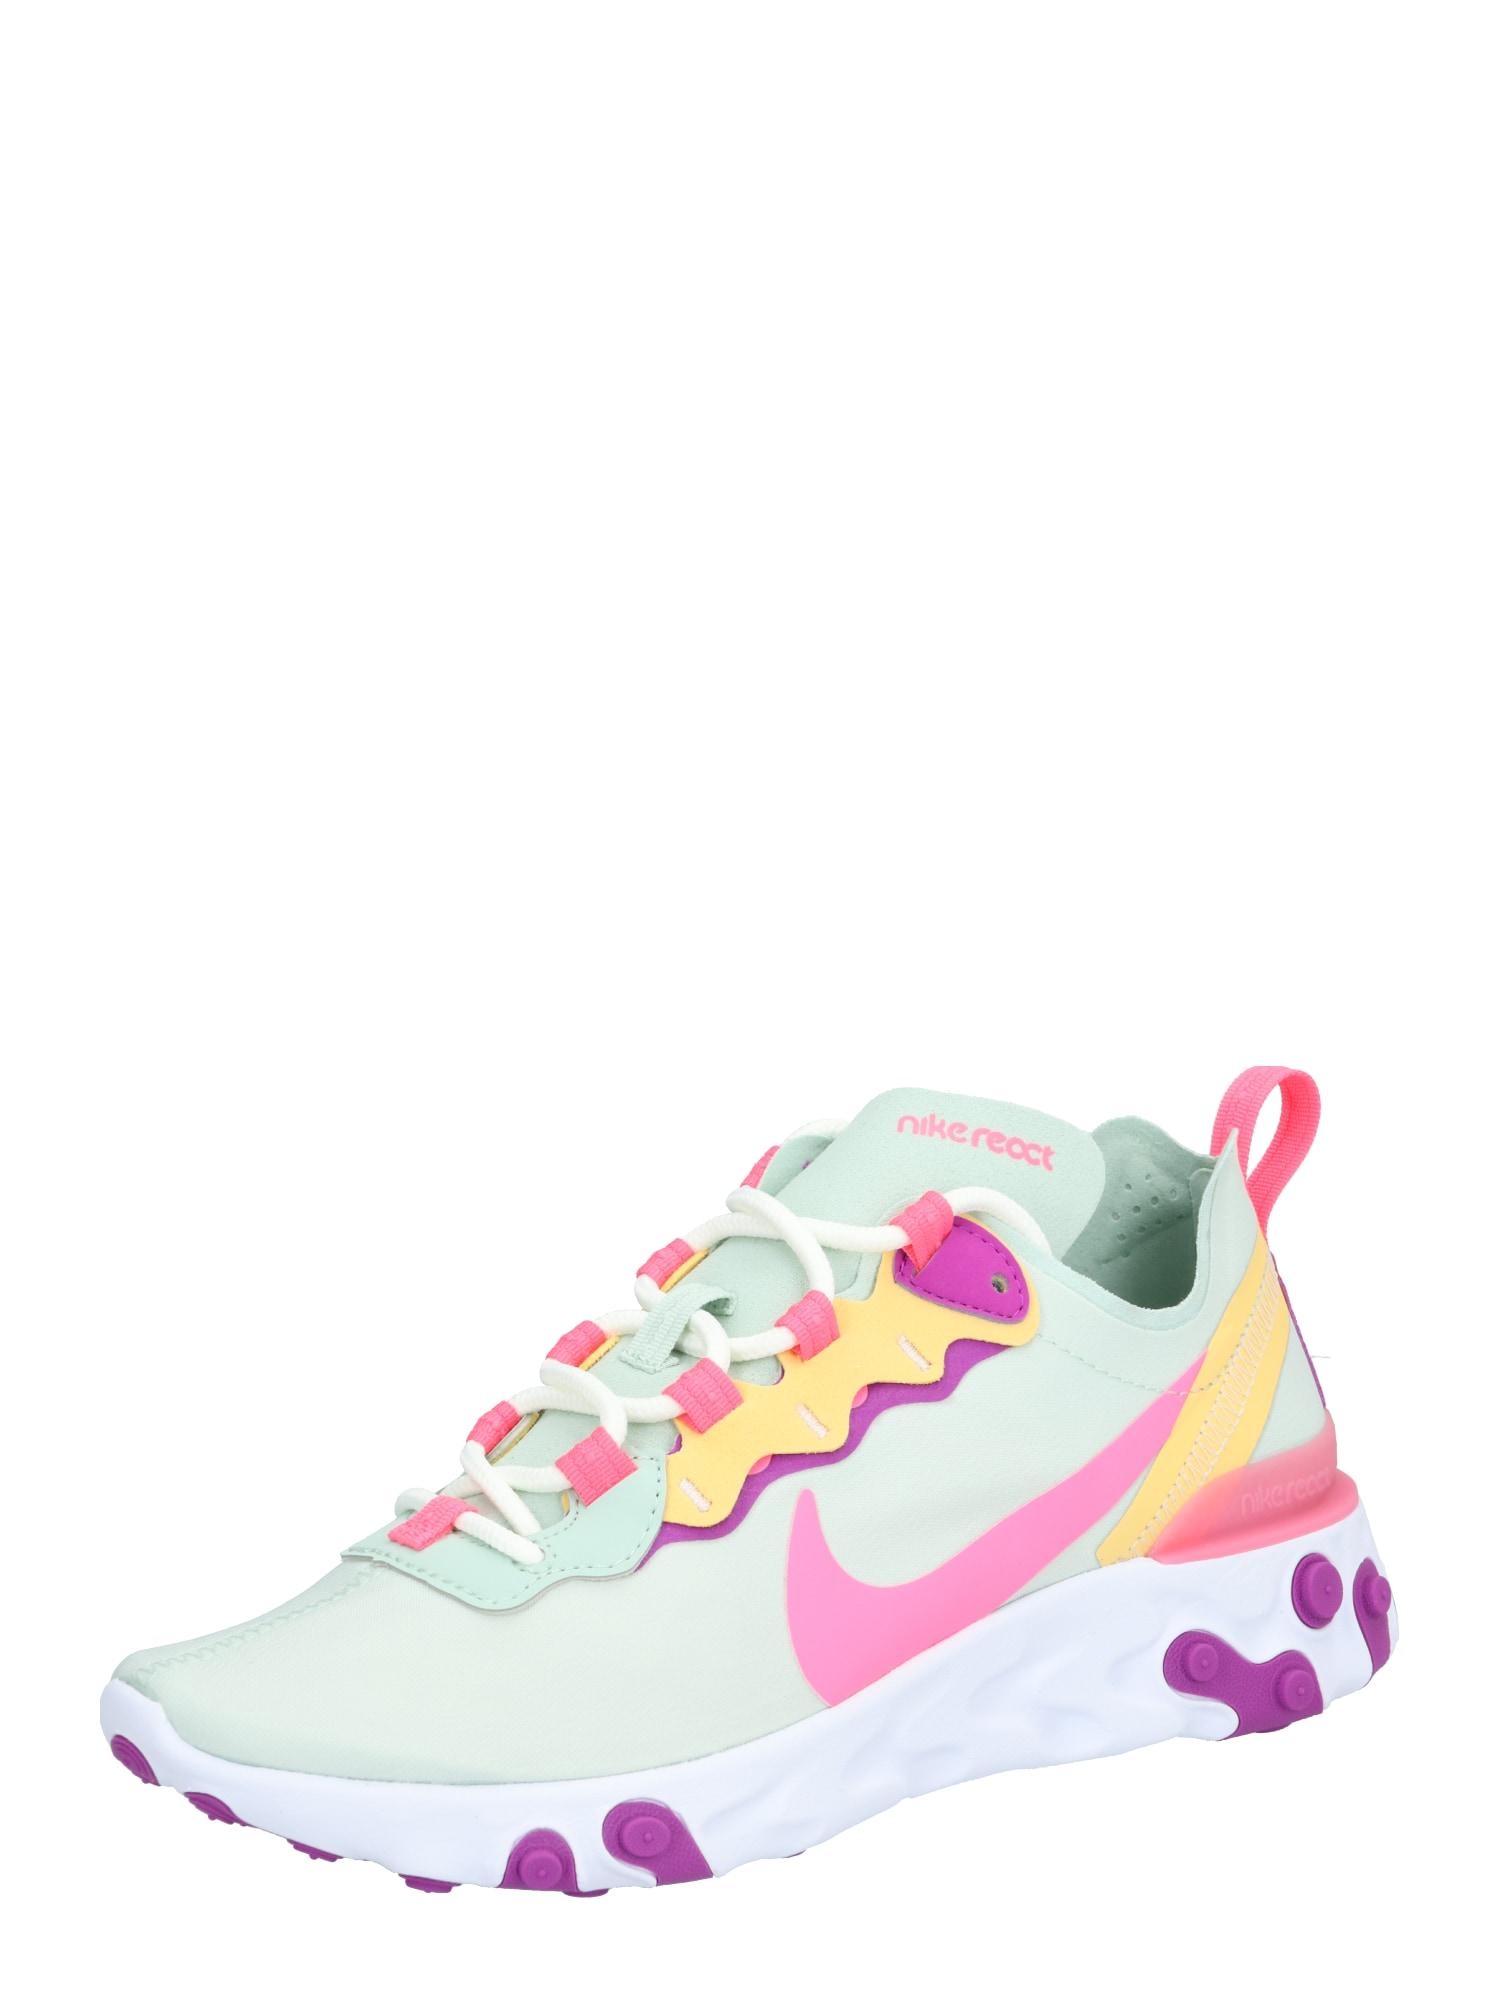 Nike Sportswear Bežecká obuv 'React Element 55'  ružová / biela / mätová / svetlooranžové